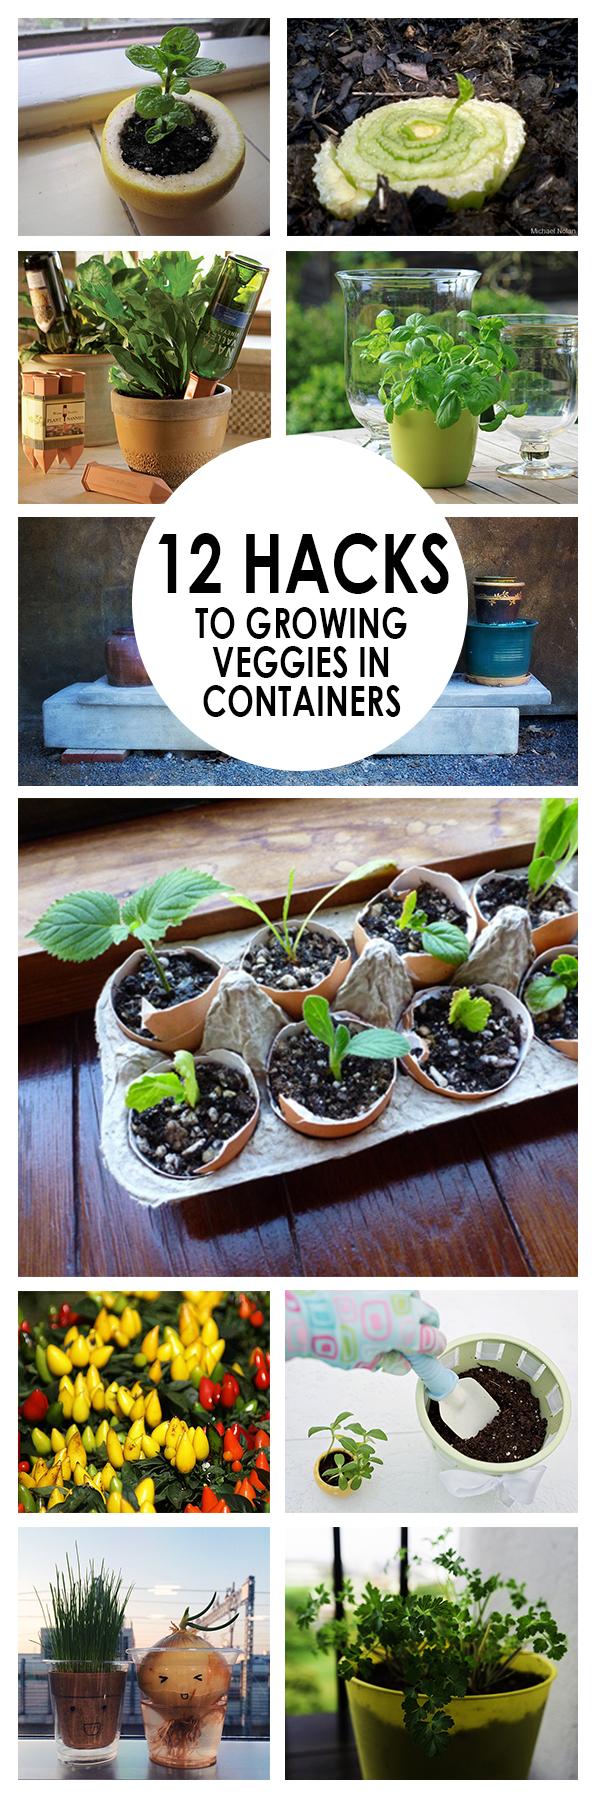 Gardening Hacks, Container gardening, DIY container gardening, gardening hacks, popular pin, gardening tips, vegetable gardening.